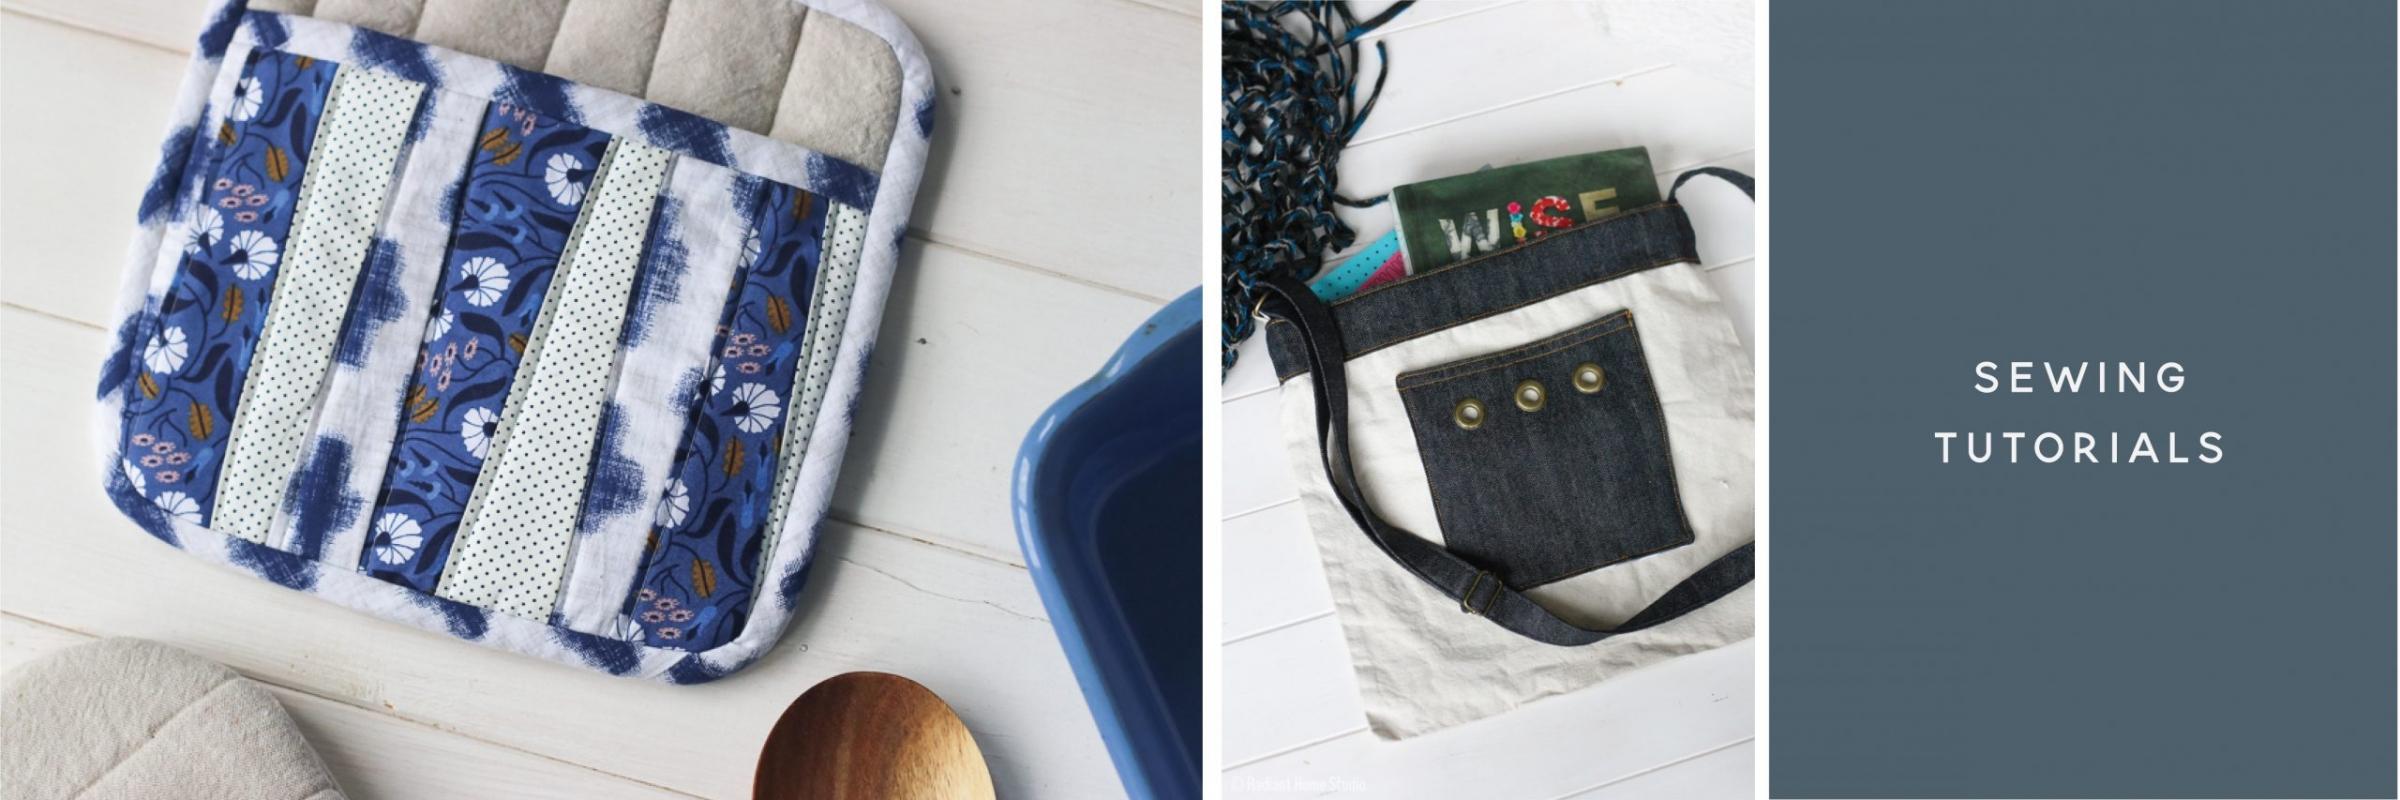 Sewing Tutorials | Radiant Home Studio